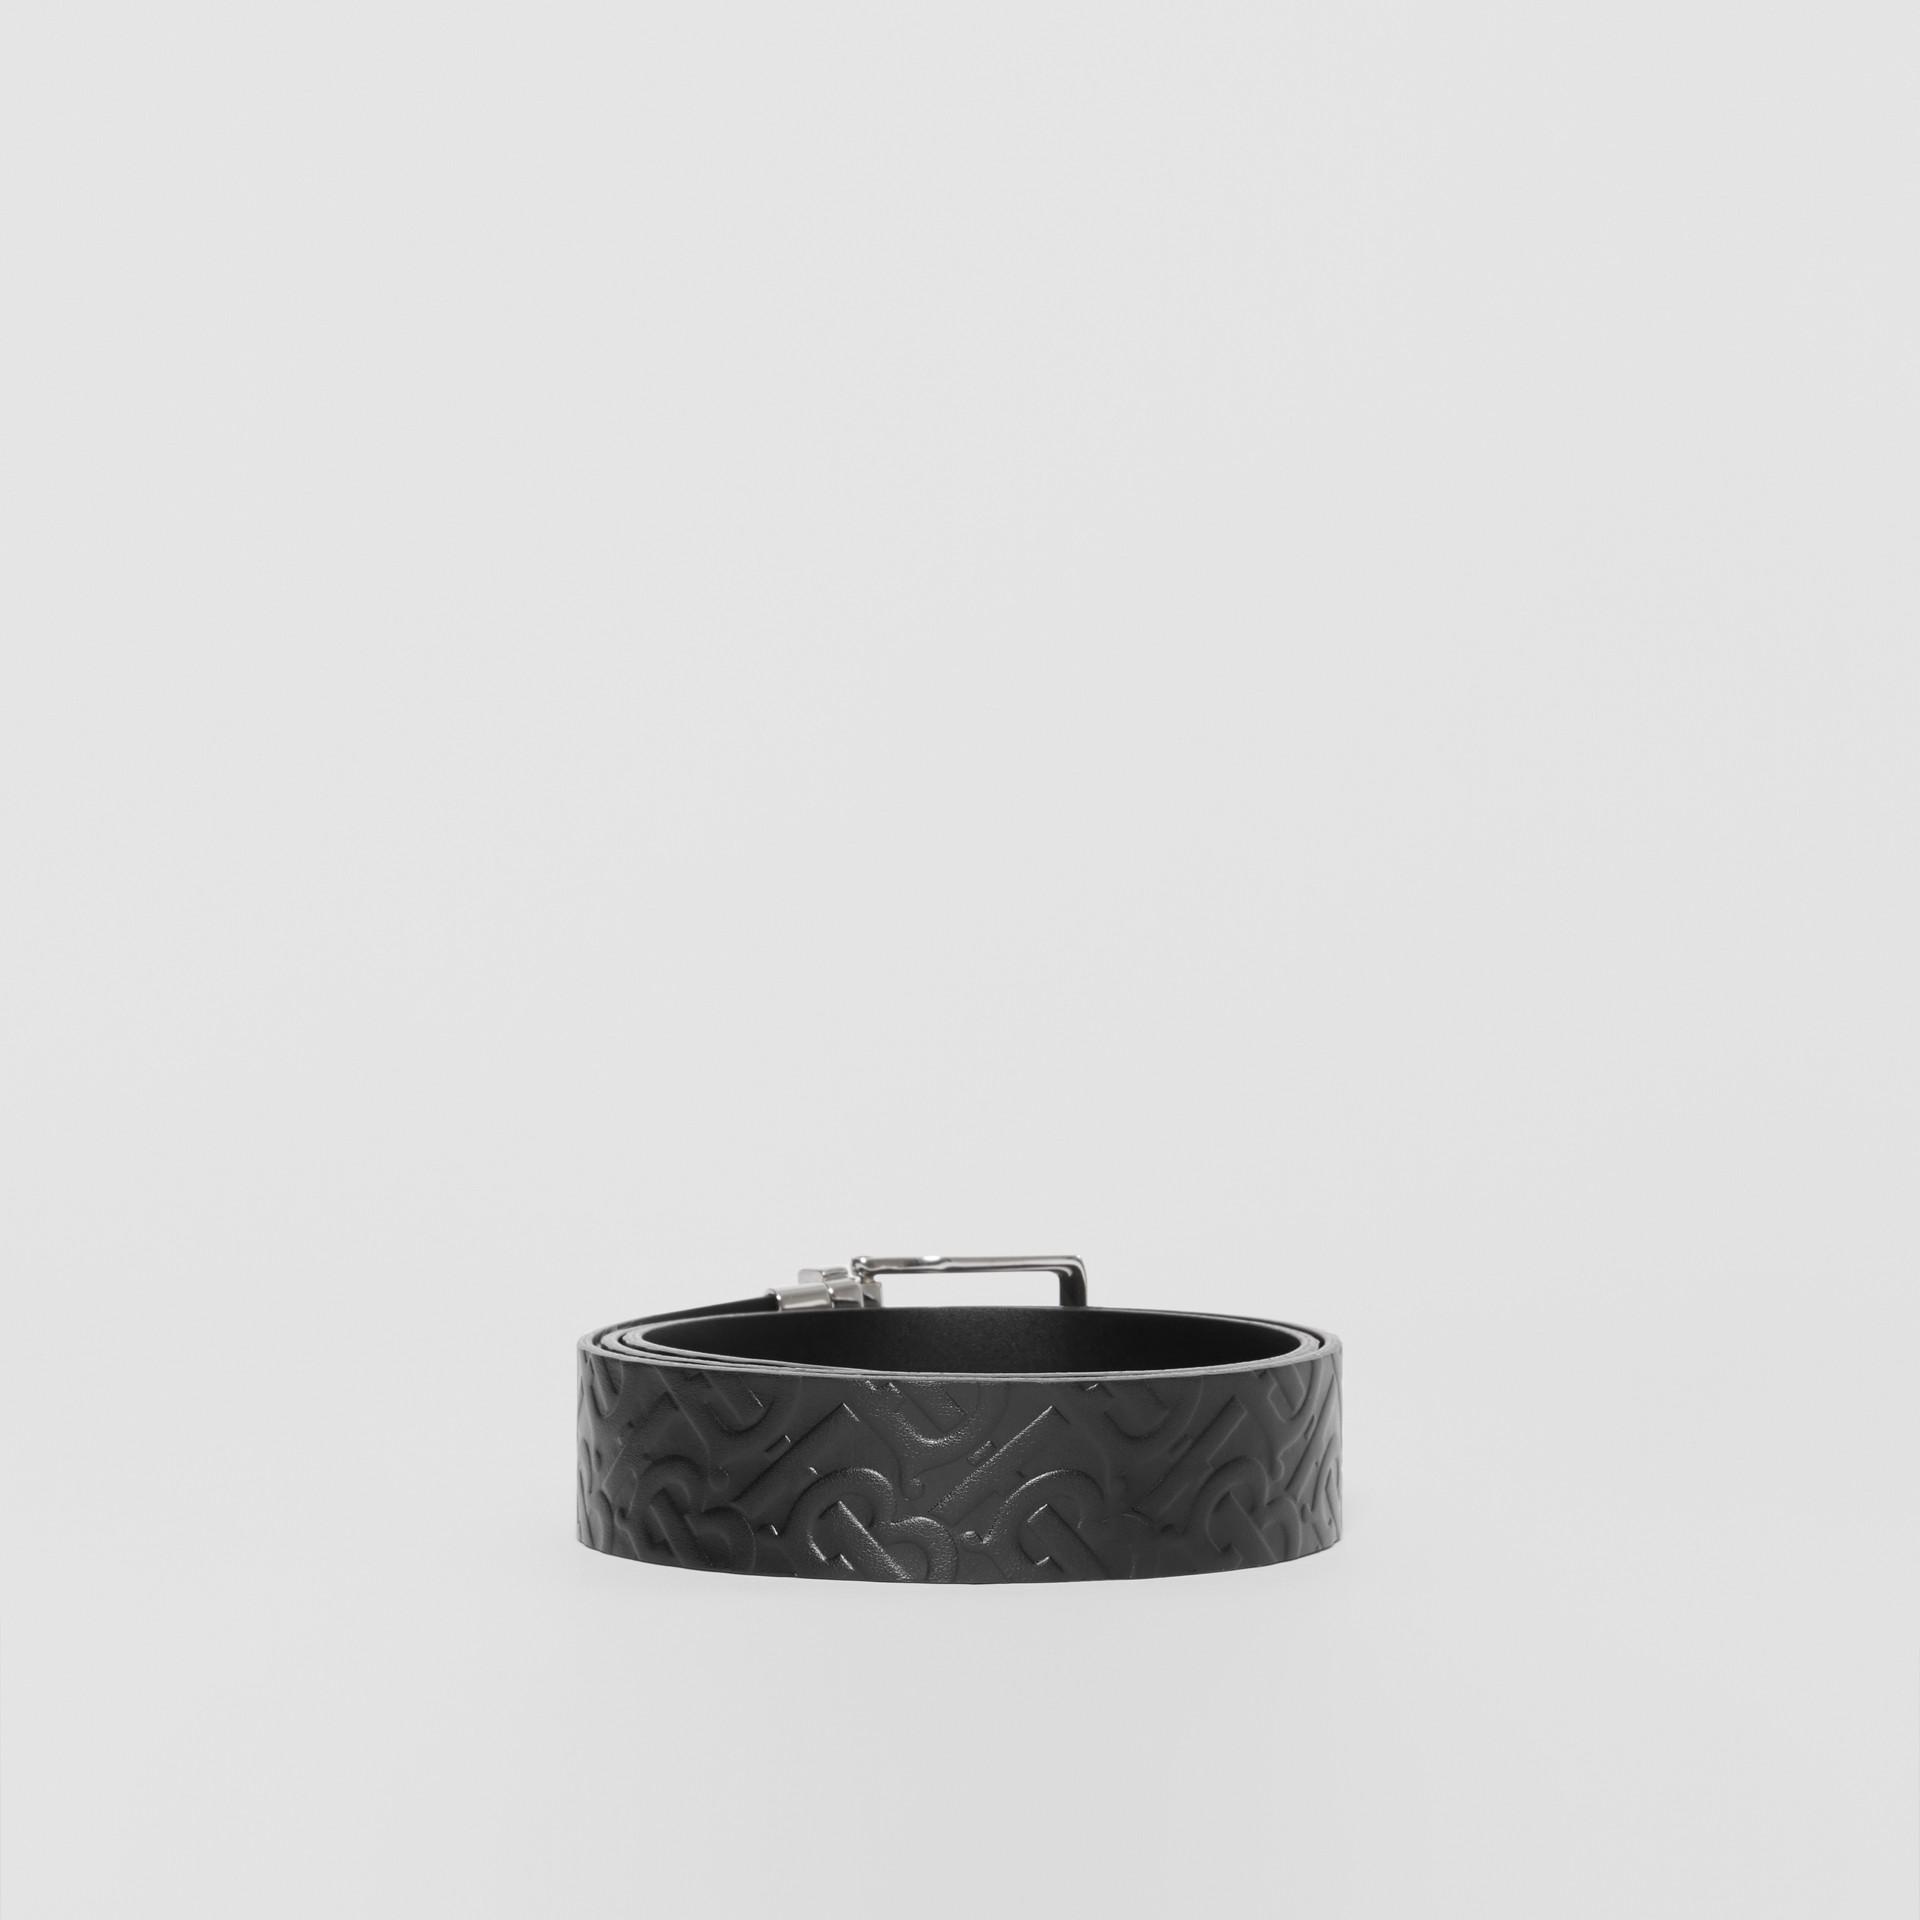 Reversible Monogram Leather Belt in Black - Men | Burberry - gallery image 4